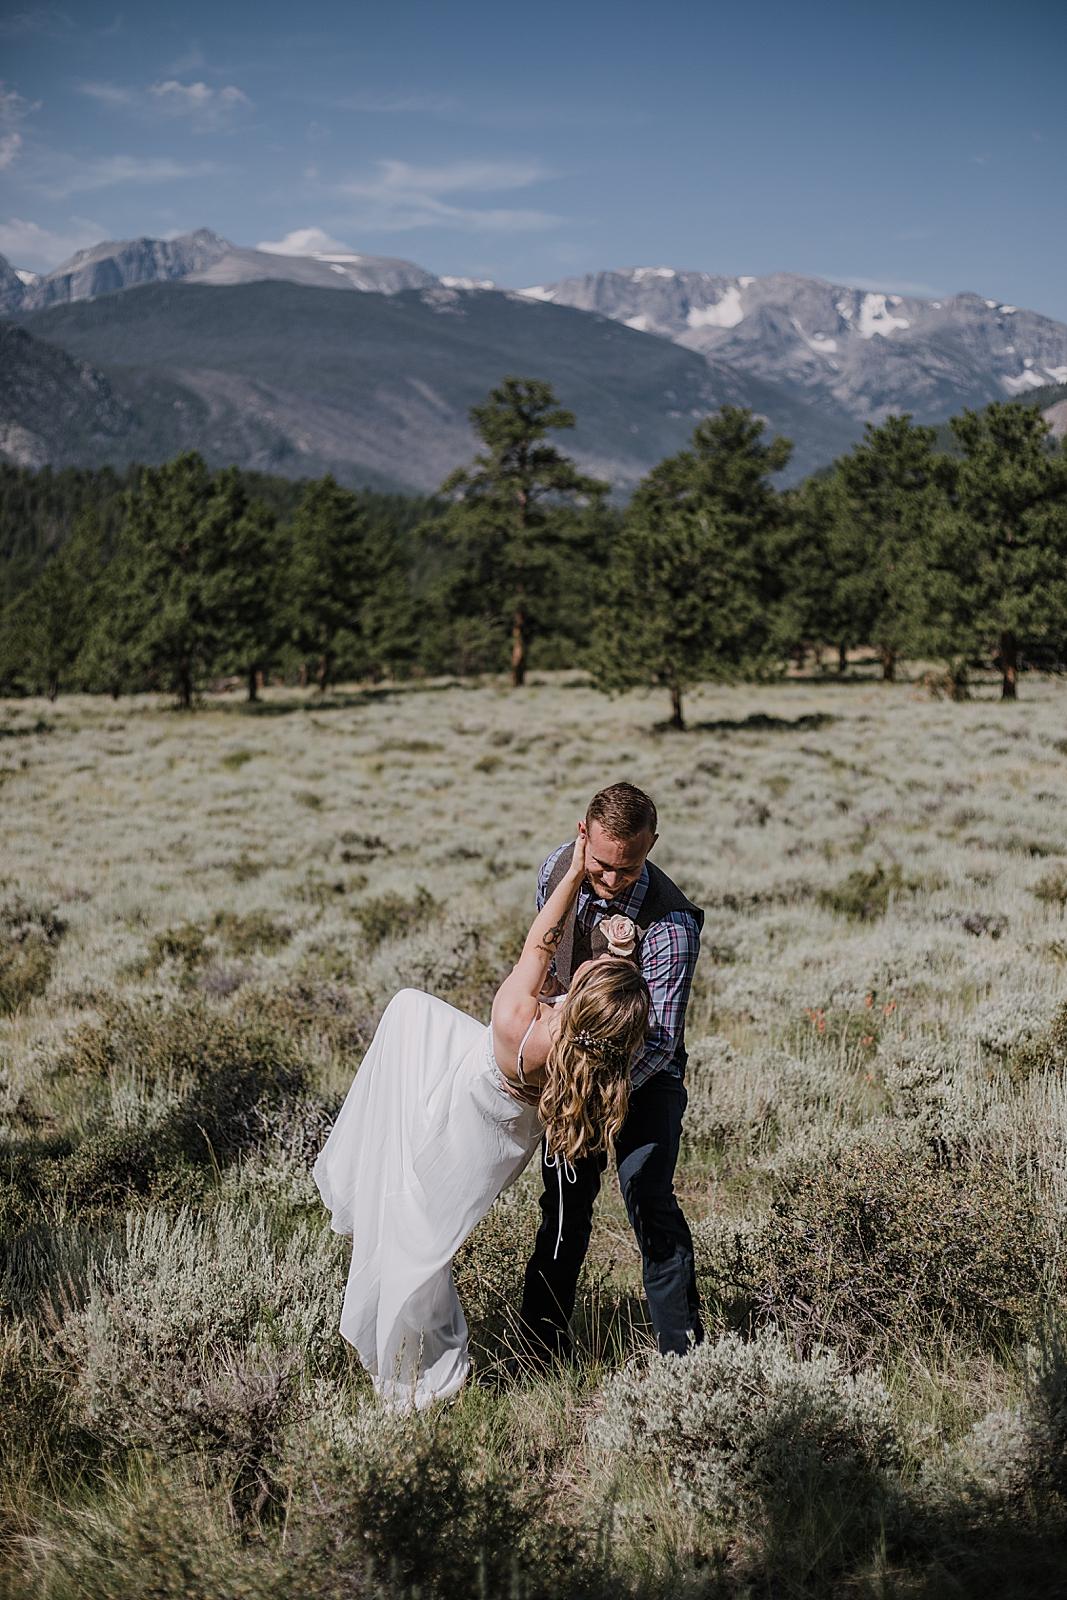 first dance, RMNP elopement ceremony, rocky mountain national park elopement, 3M curves elopement, self solemnizing, self solemnization, long's peak, summer elopement, estes park elopement